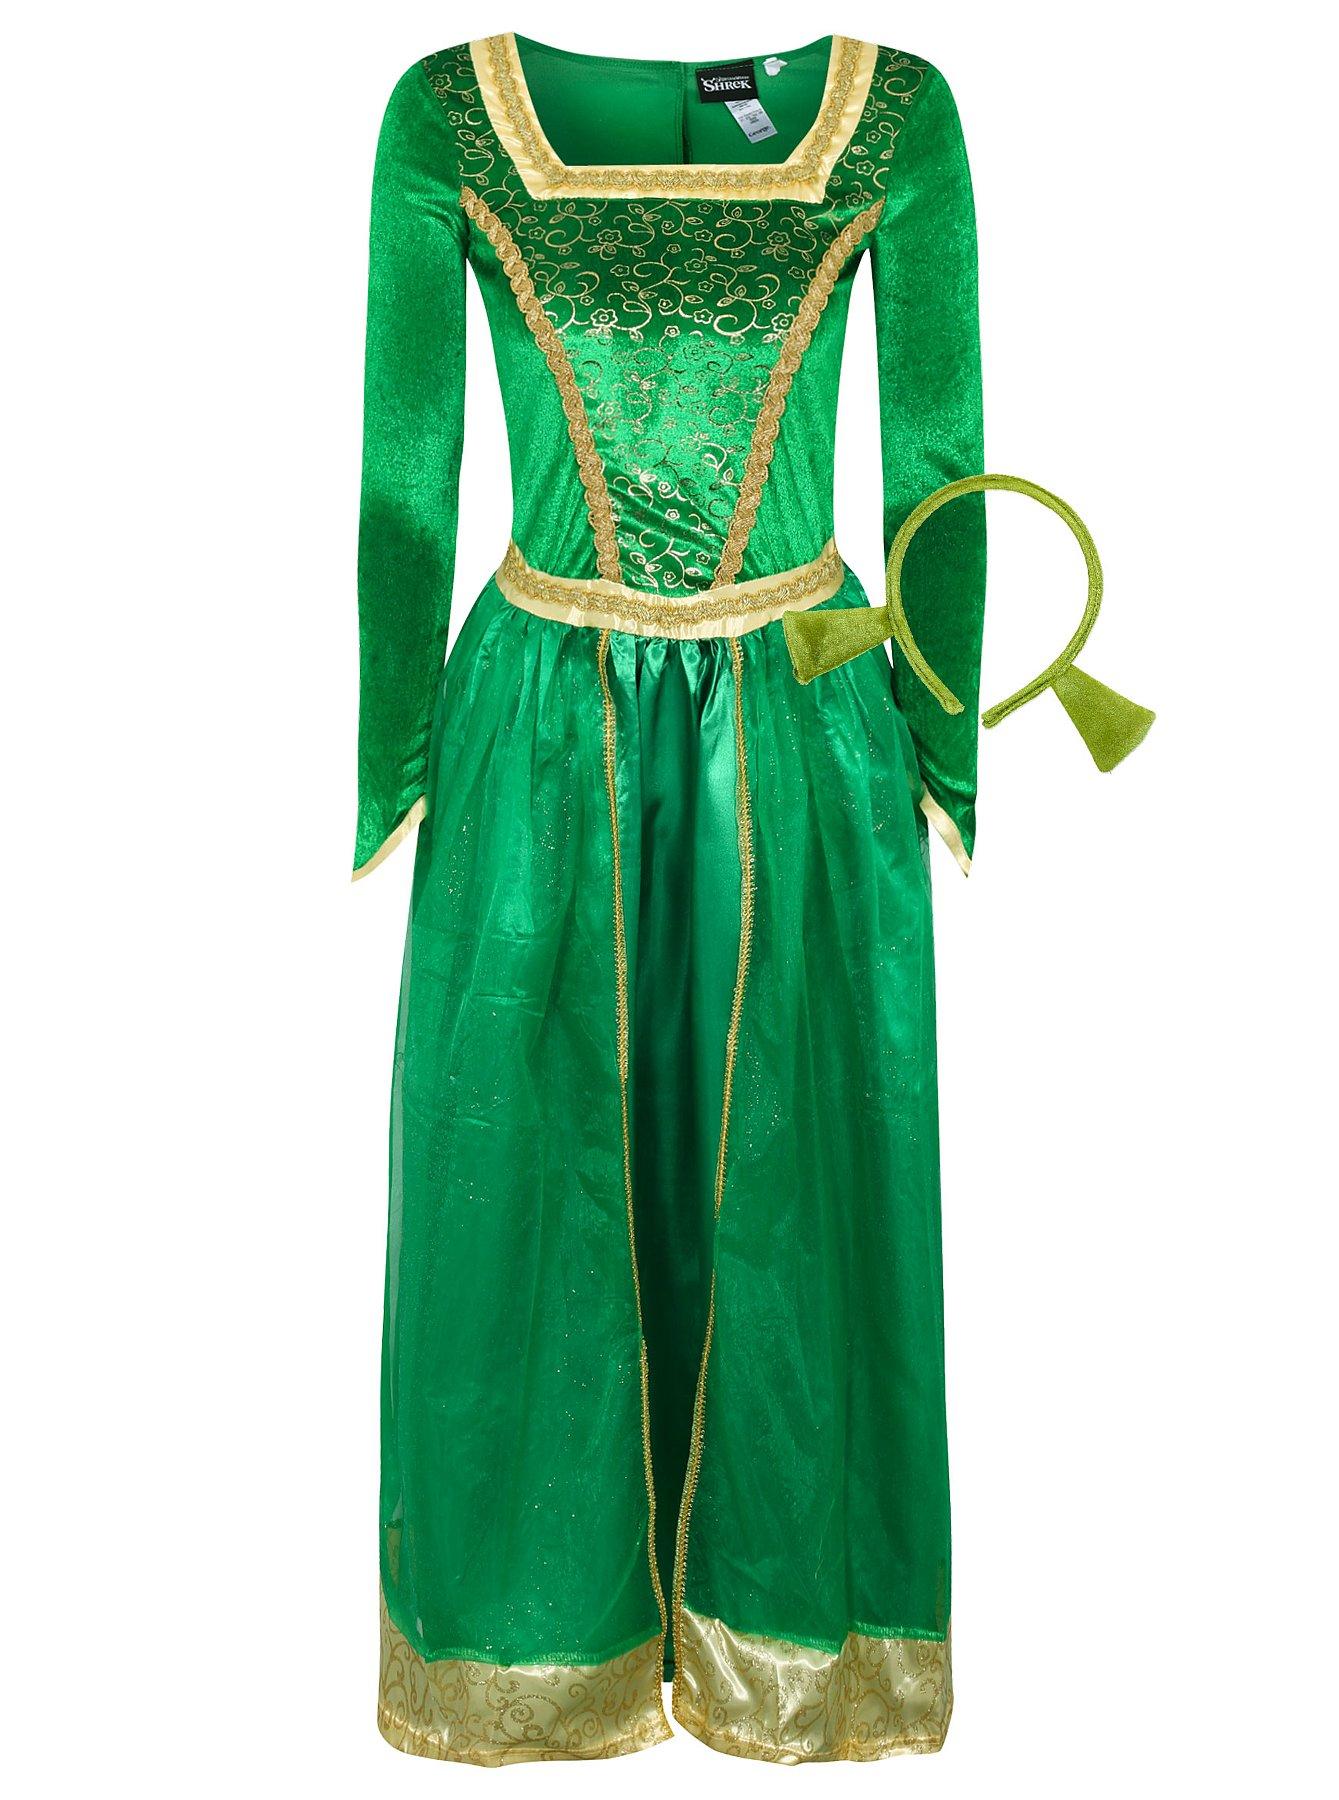 Ladies leather gloves asda - Adult Princess Fiona Shrek Fancy Dress Costume